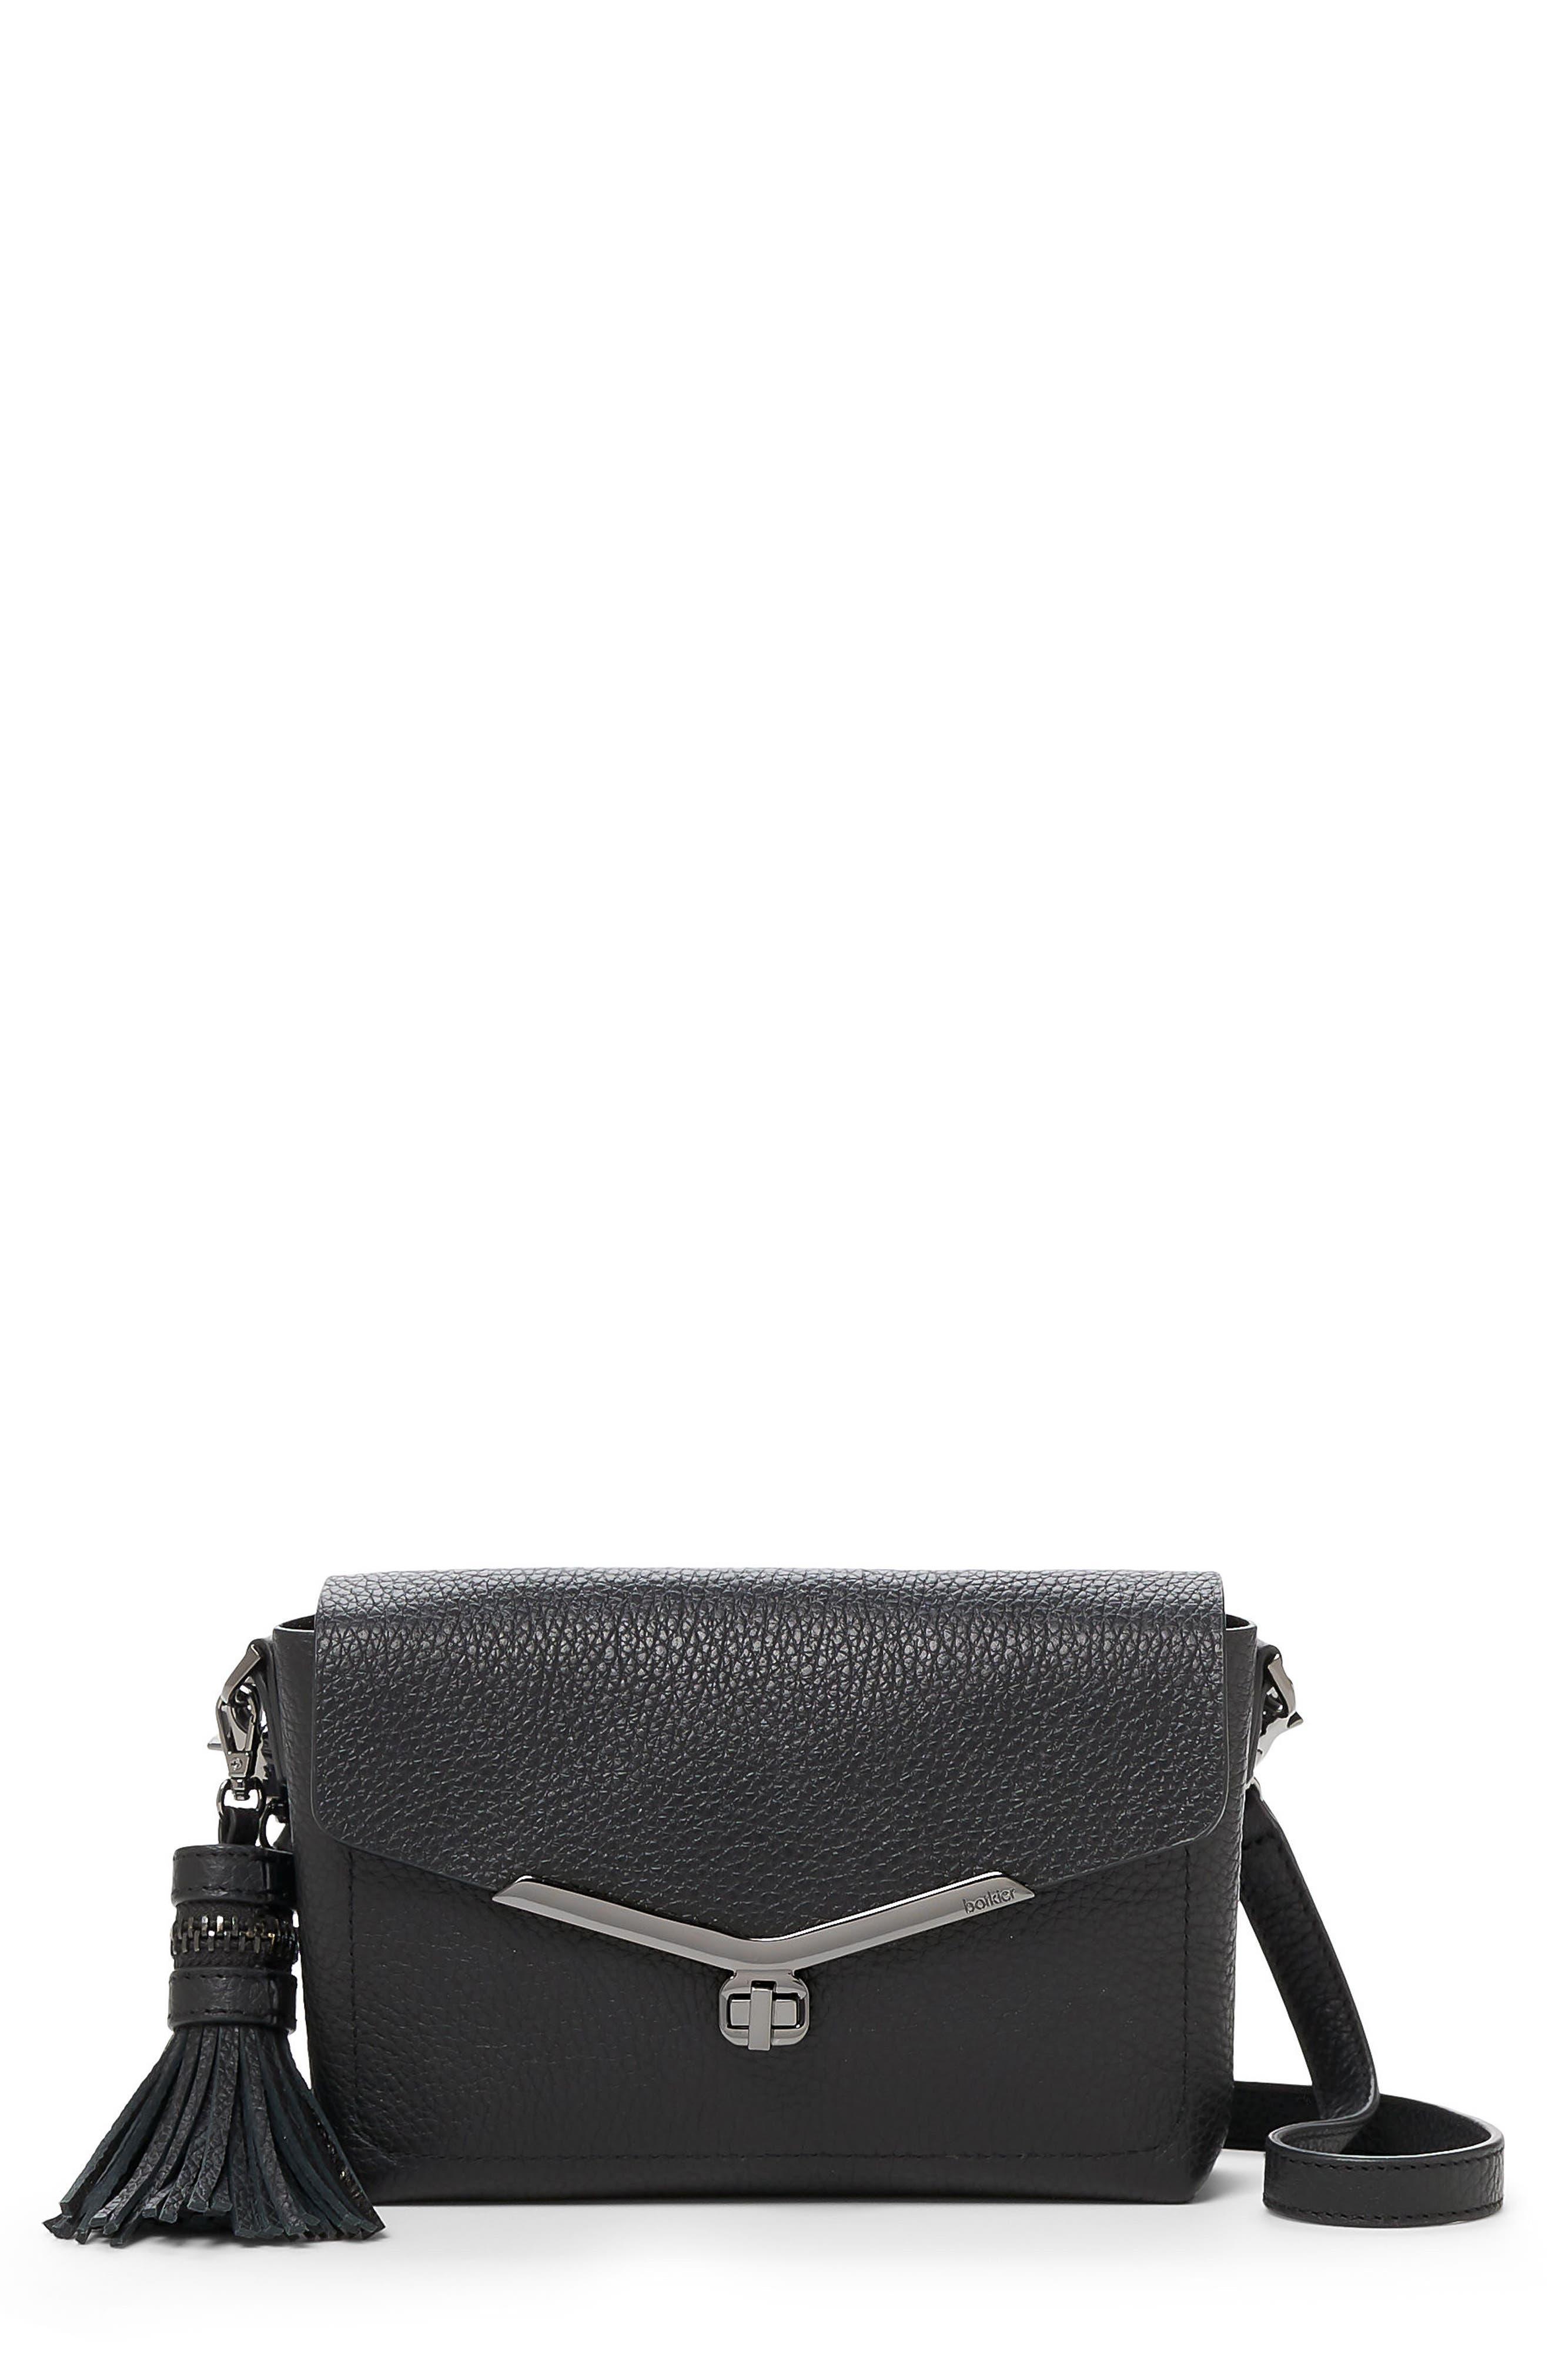 Vivi Leather Crossbody Bag,                             Main thumbnail 1, color,                             Black